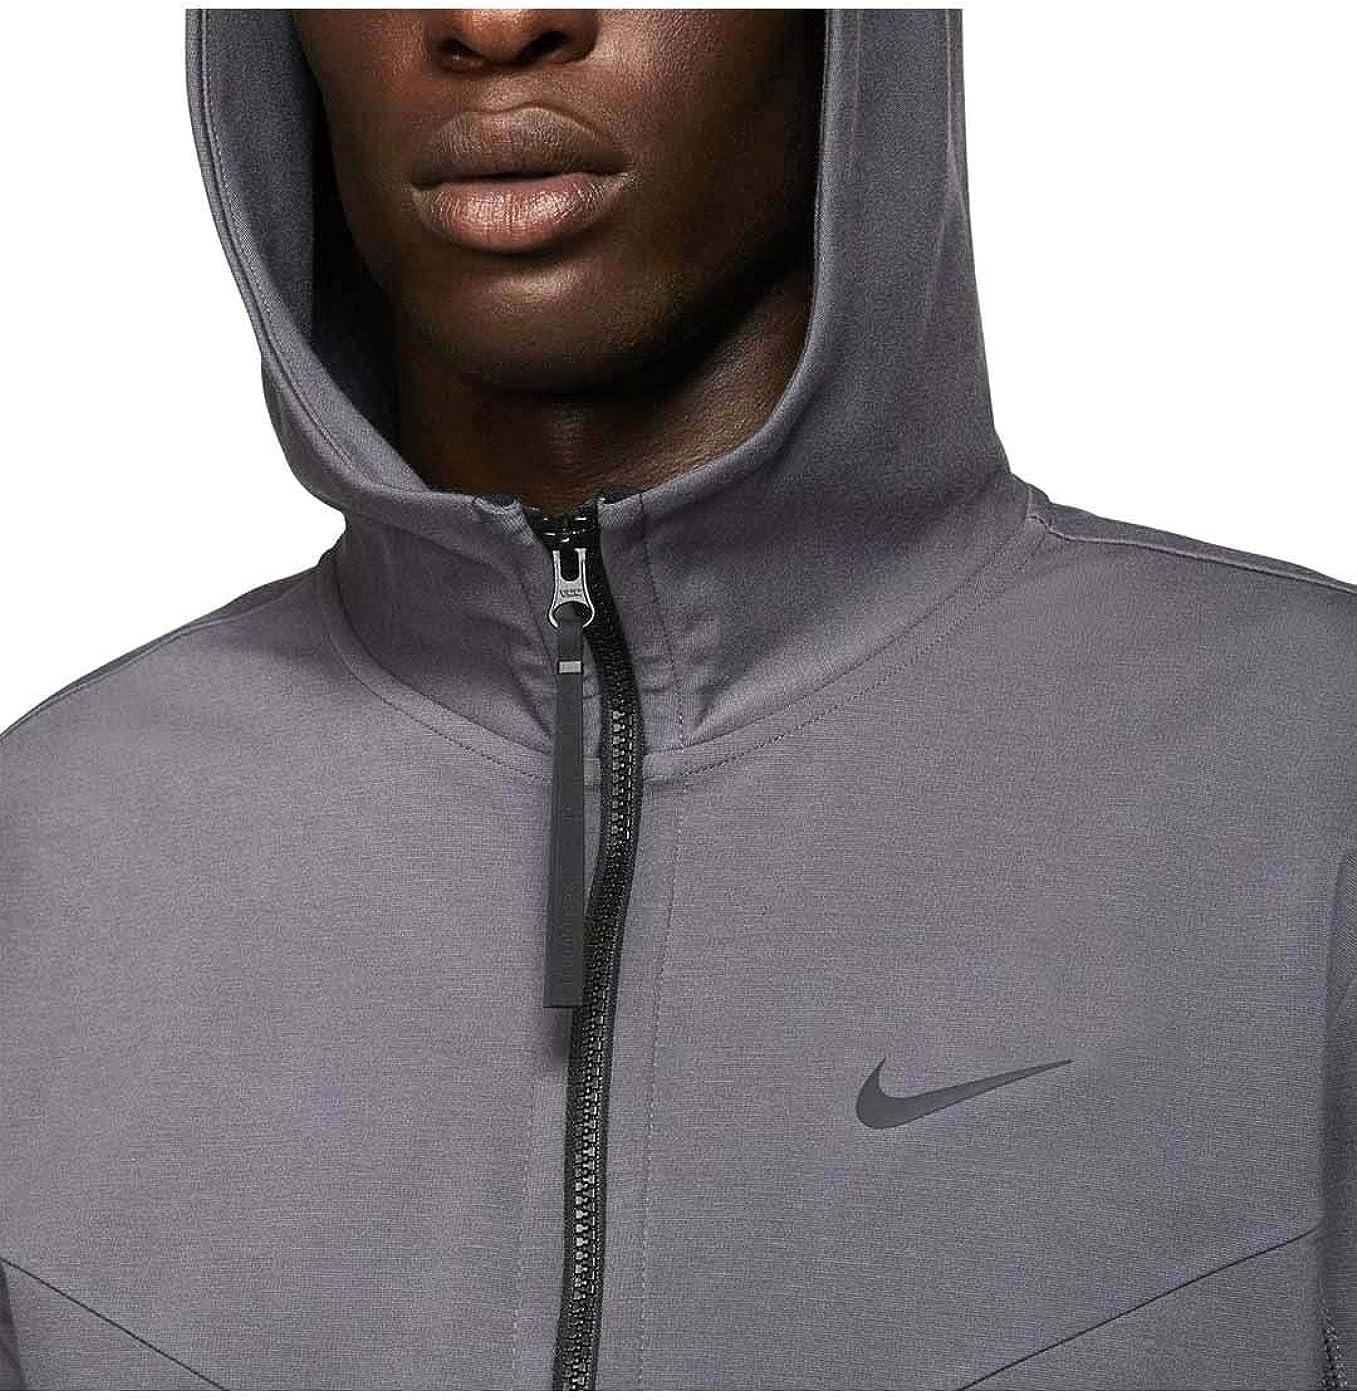 Nike Chaqueta Sportswear Tech Pack Dark Grey/Black Small Gris: Amazon.es: Ropa y accesorios